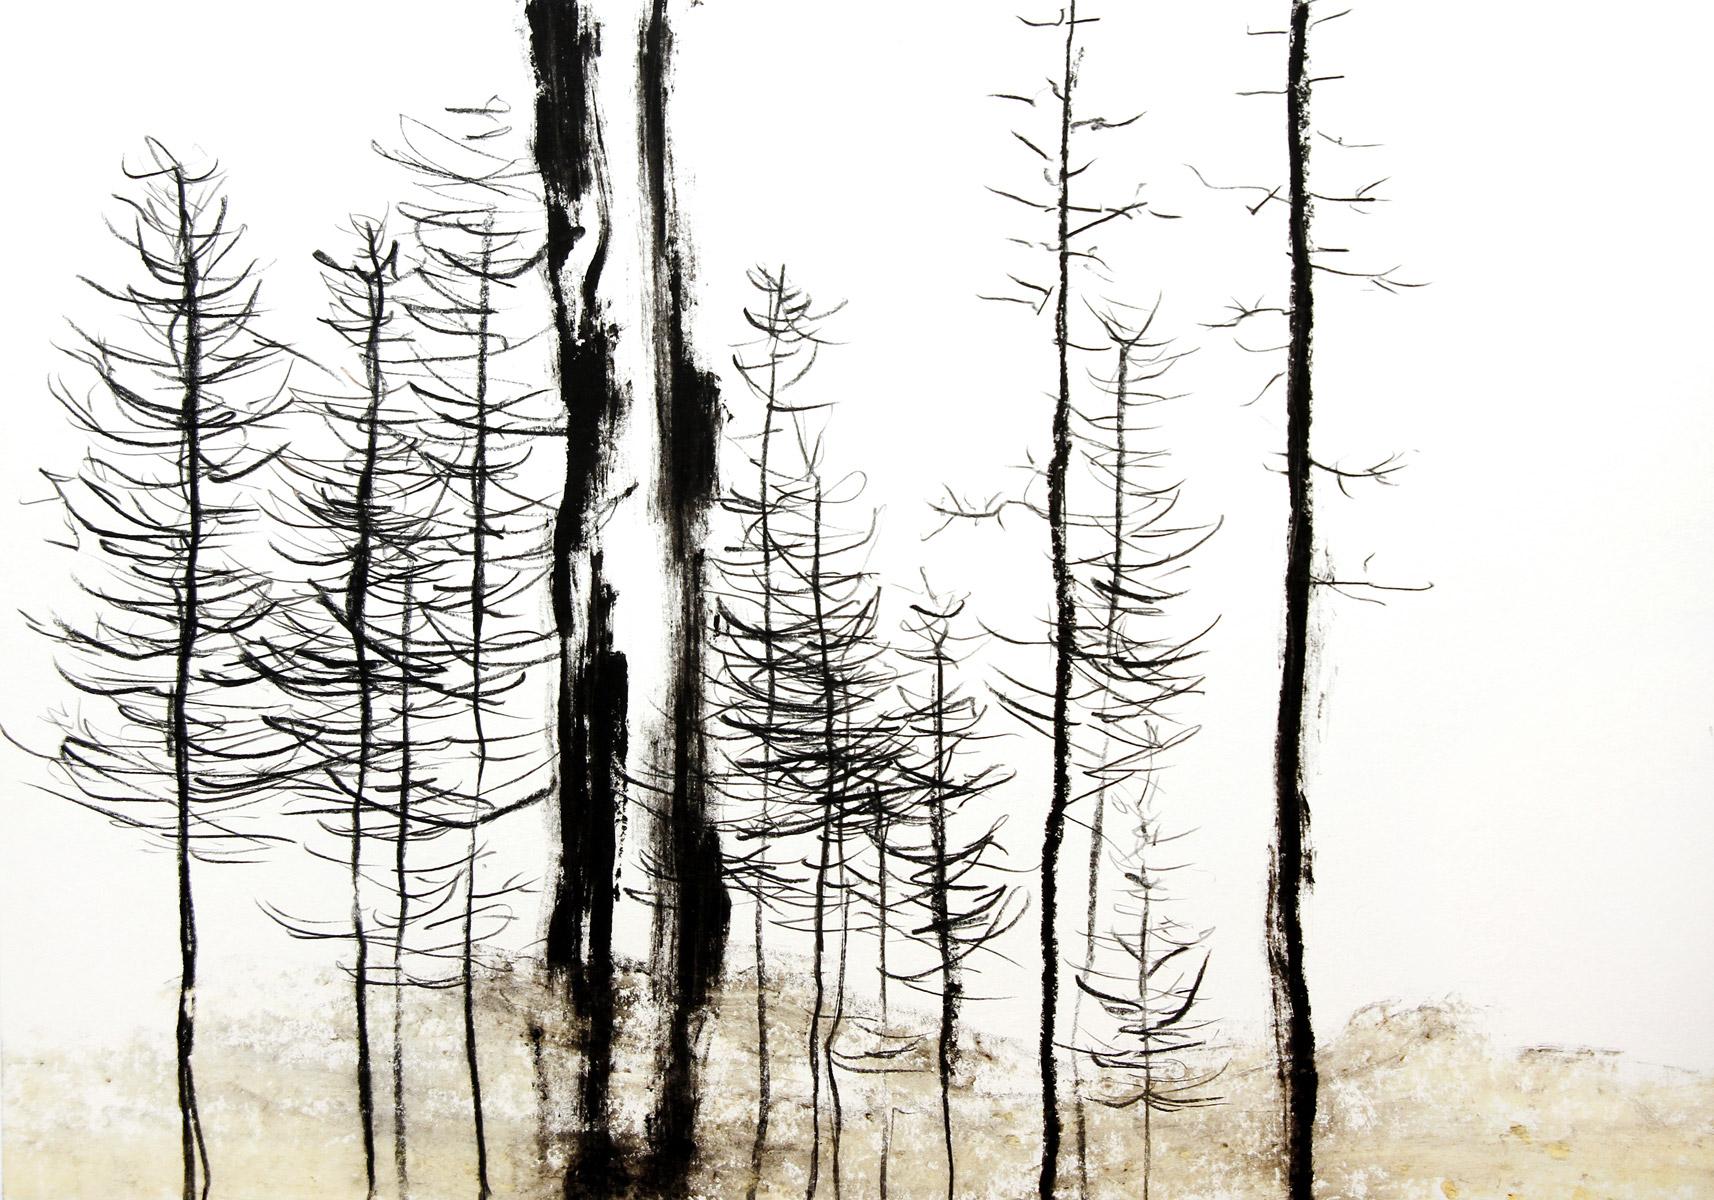 Grauer Wald, 2020, 59,4cm x 42cm